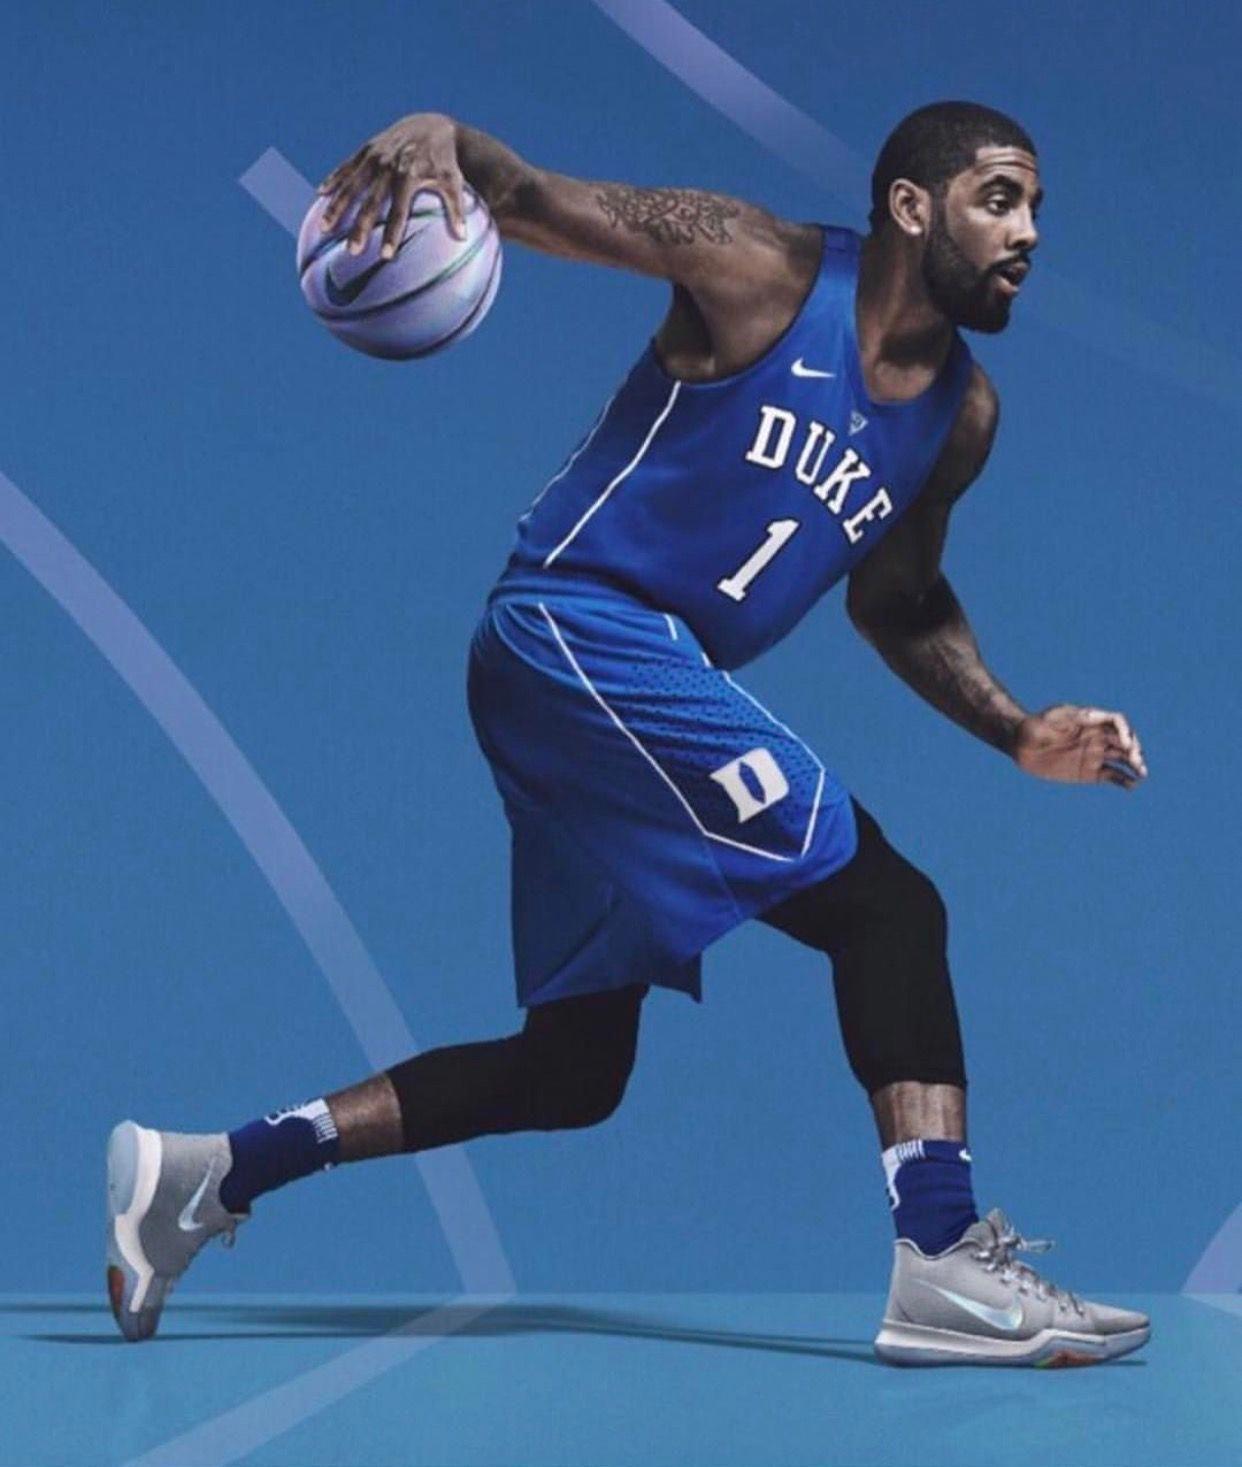 sports shoes 64e40 f2d40 Duke x Kyrie  betterbasketball